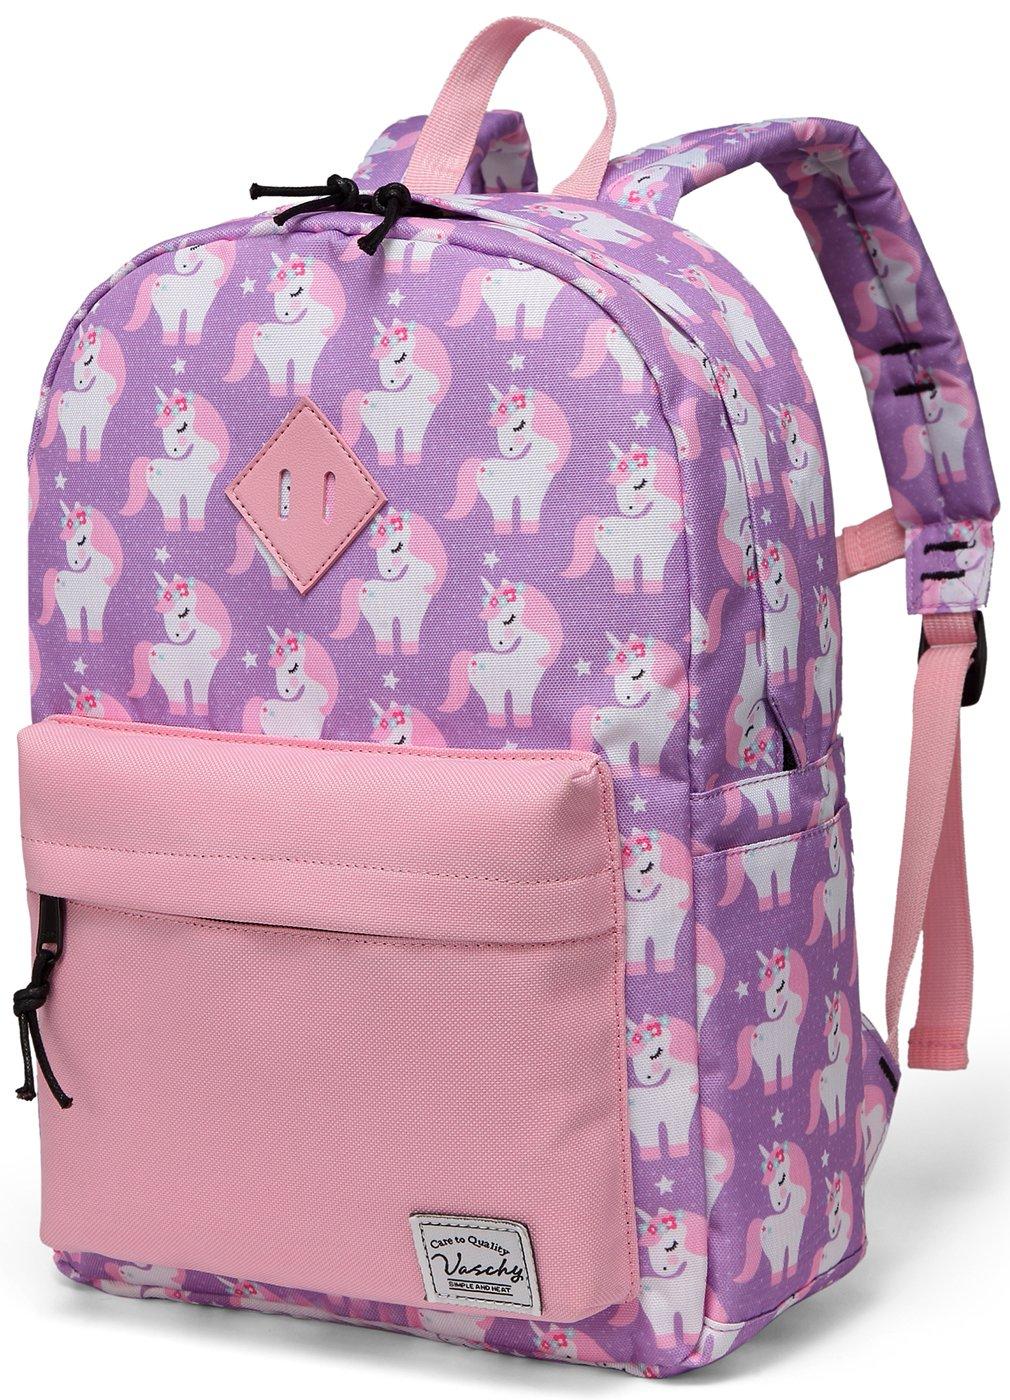 Backpack Preschool Backpacks kindergarten Unicorn